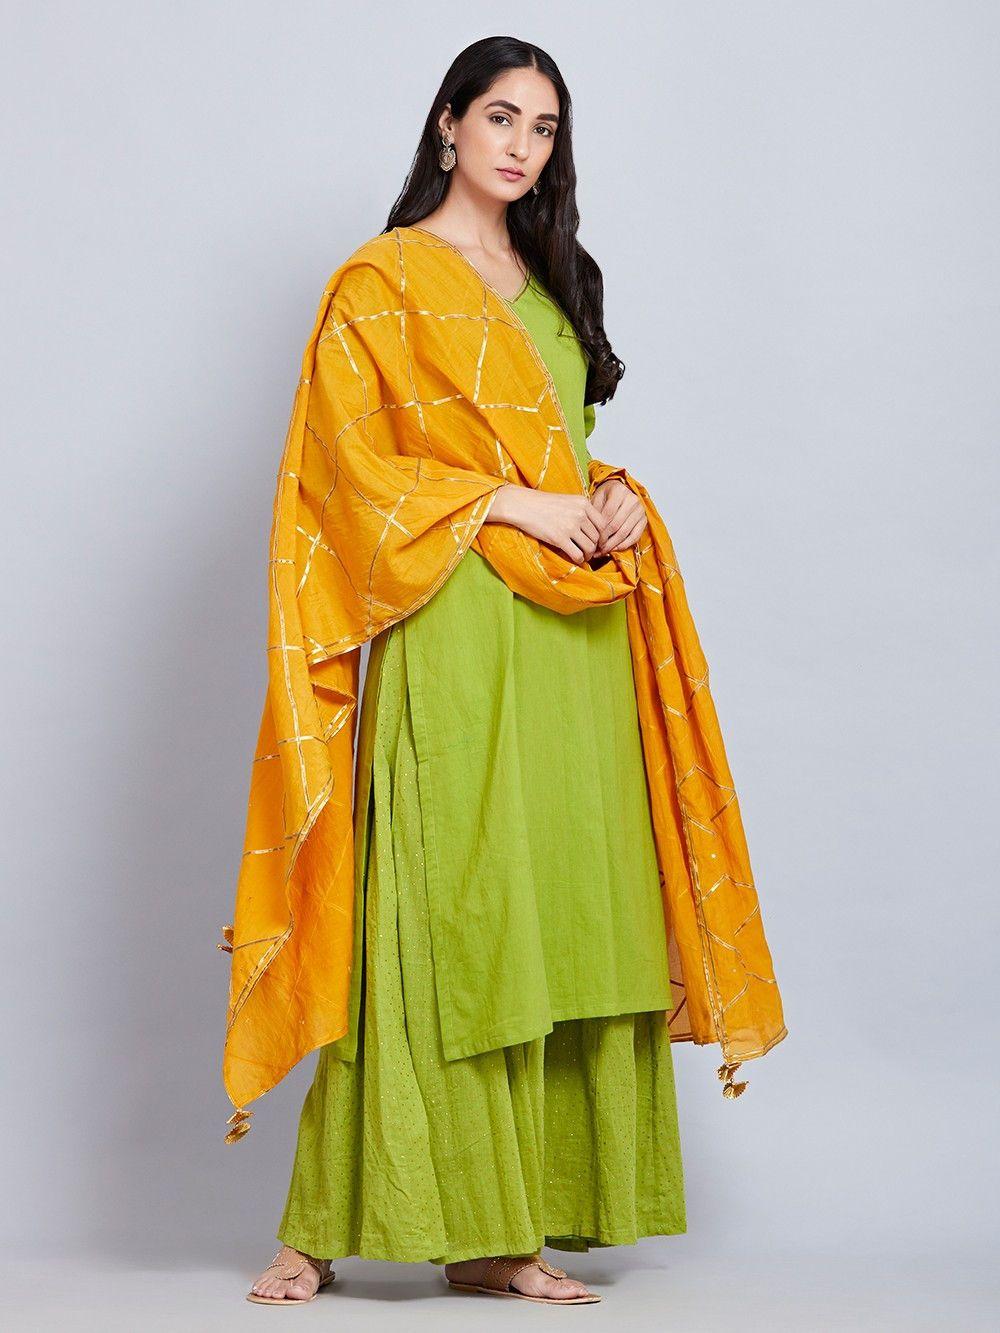 12c0a2f482 Buy Green Cotton Kurta with Hand Block Printed Sharara and Yellow Gota  Dupatta - Set of 3 online at Theloom